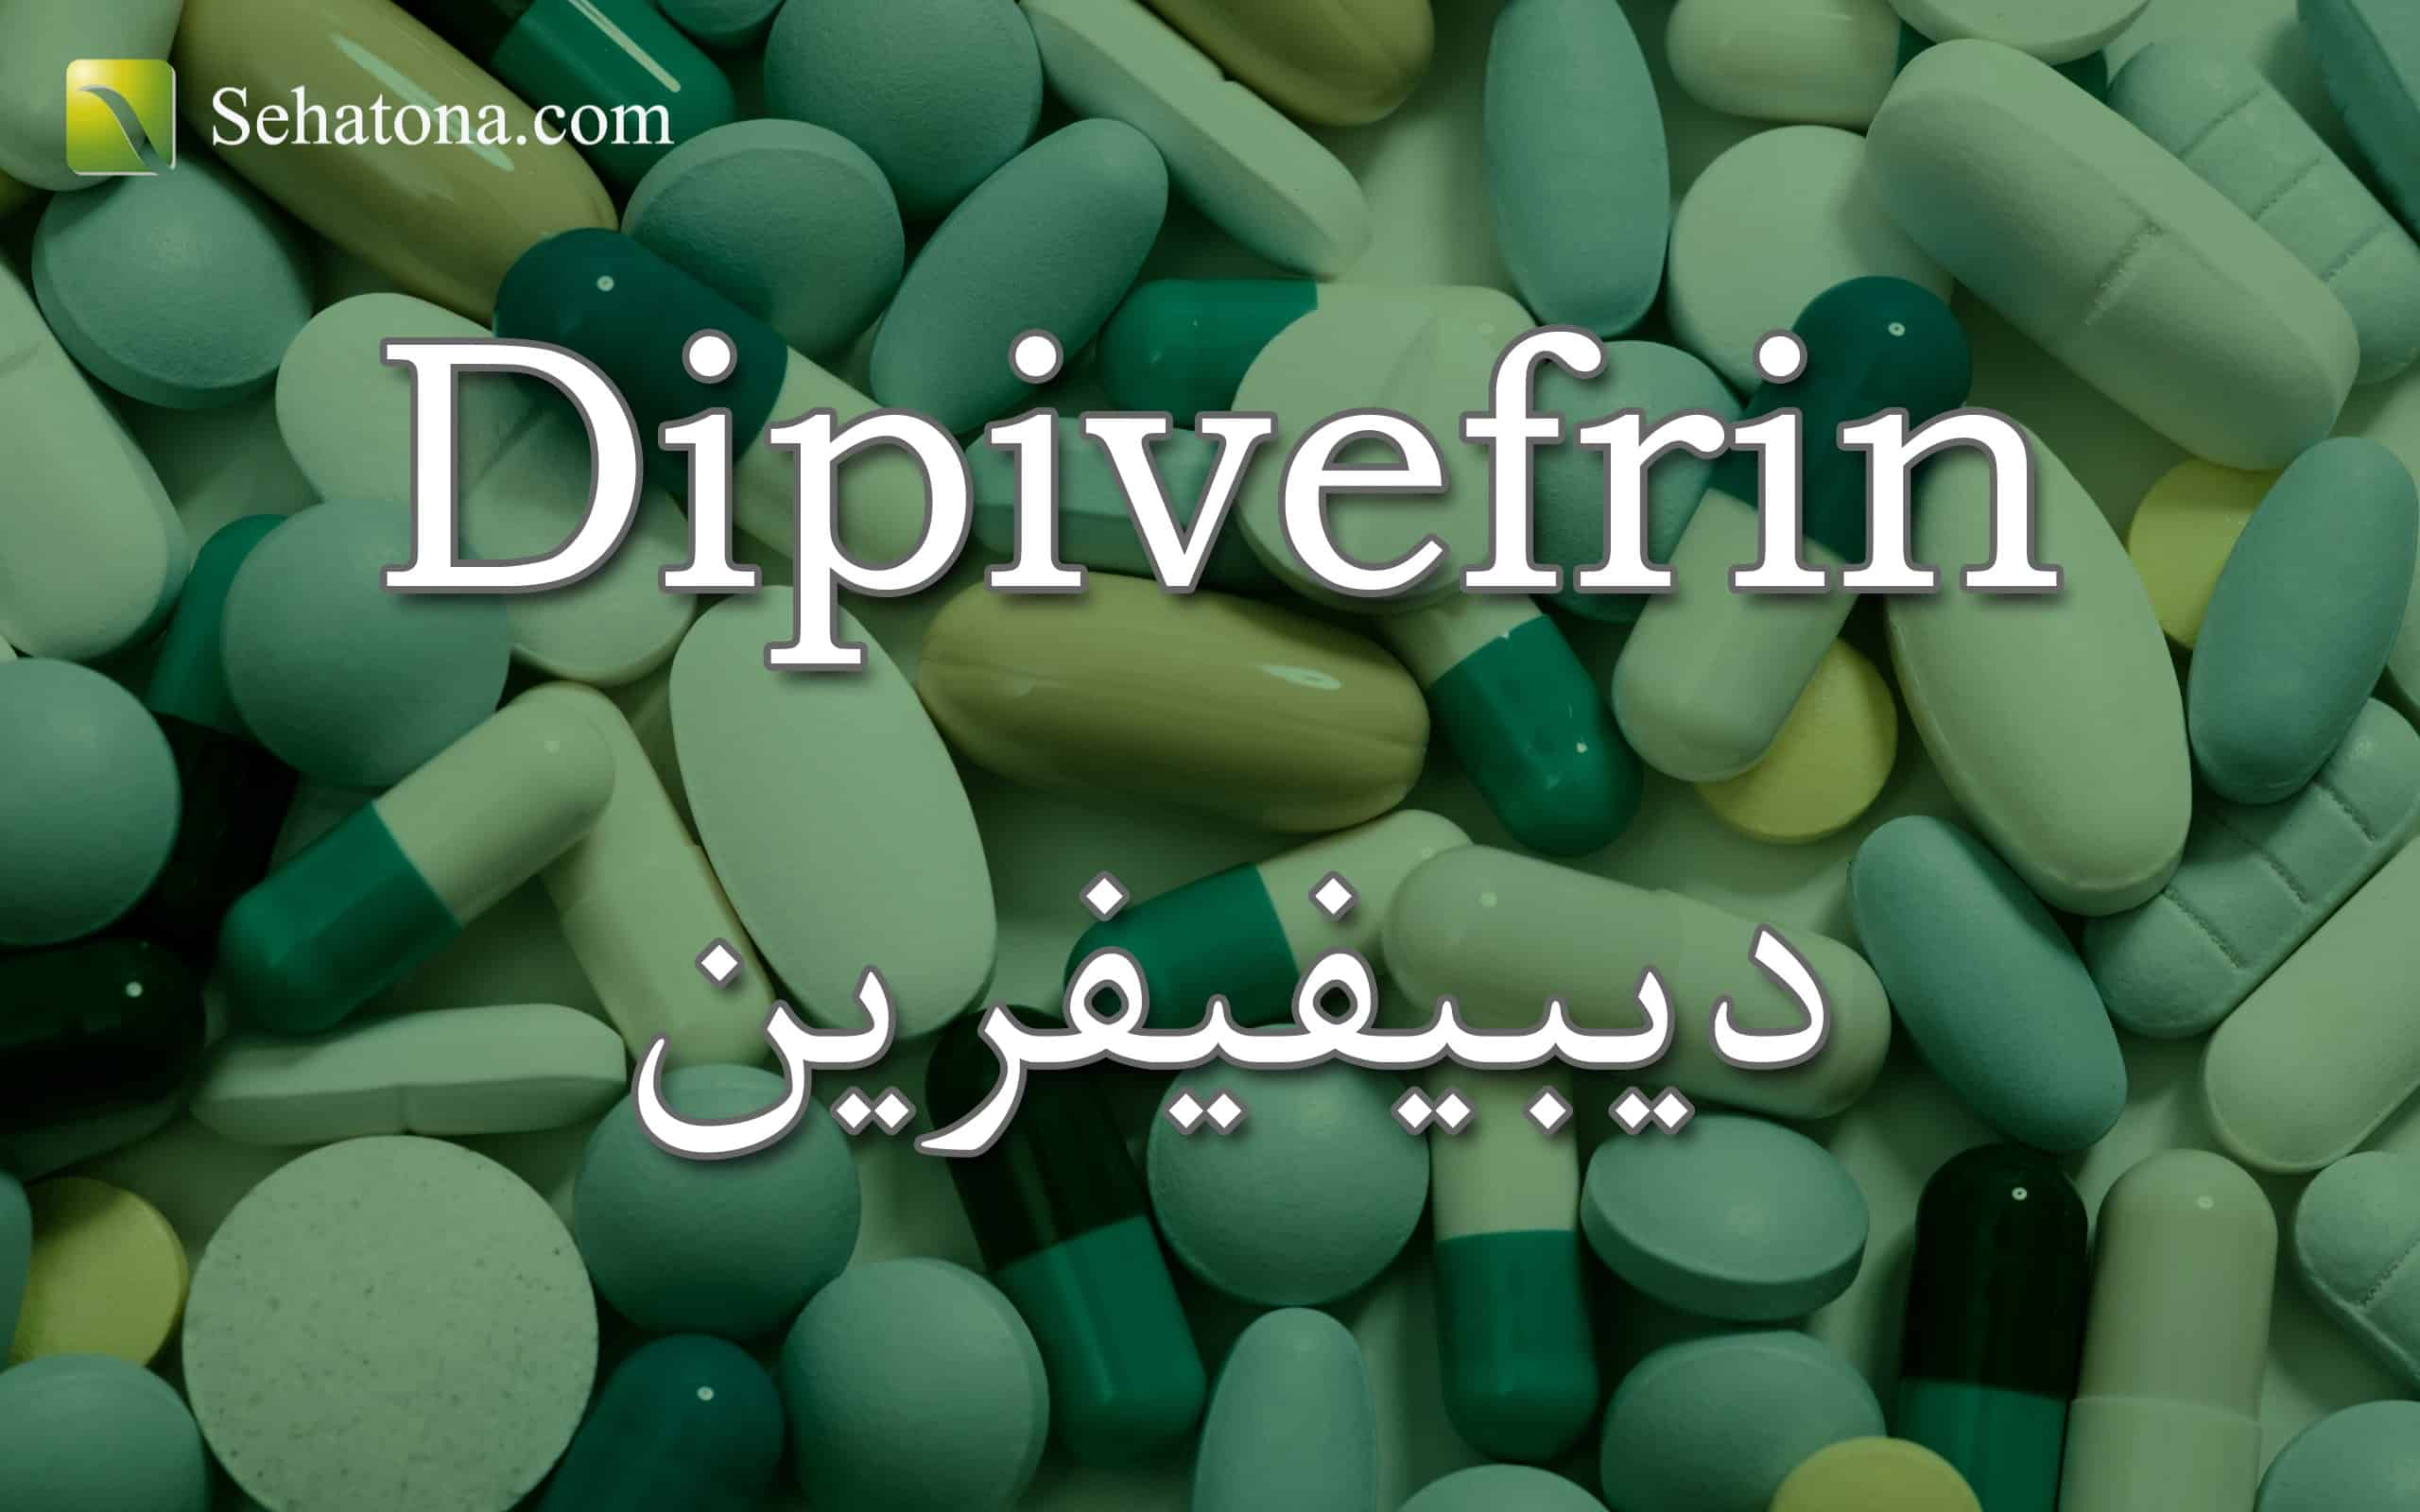 Dipivefrin